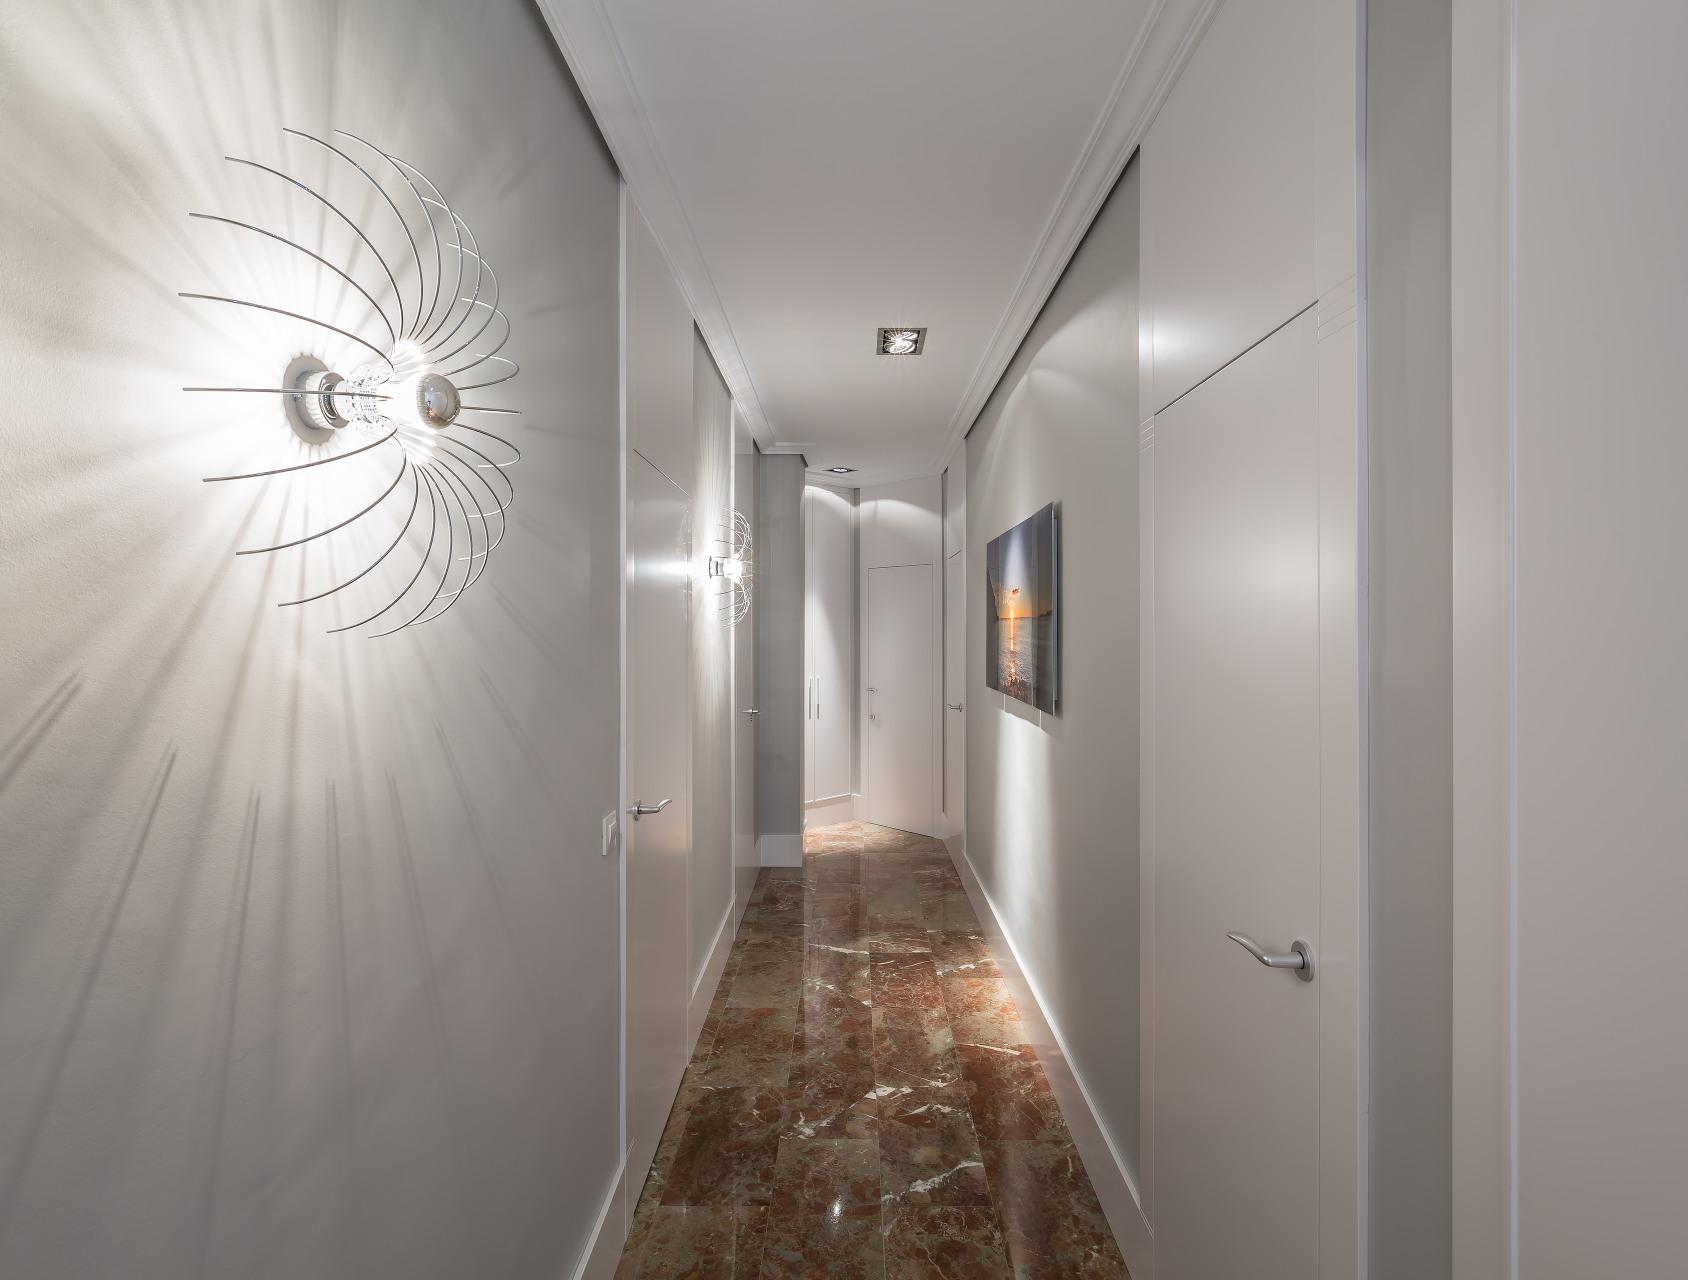 fotografia-arquitectura-interiorismo-valencia-amoros-german-cabo-laura-yerpes (12)